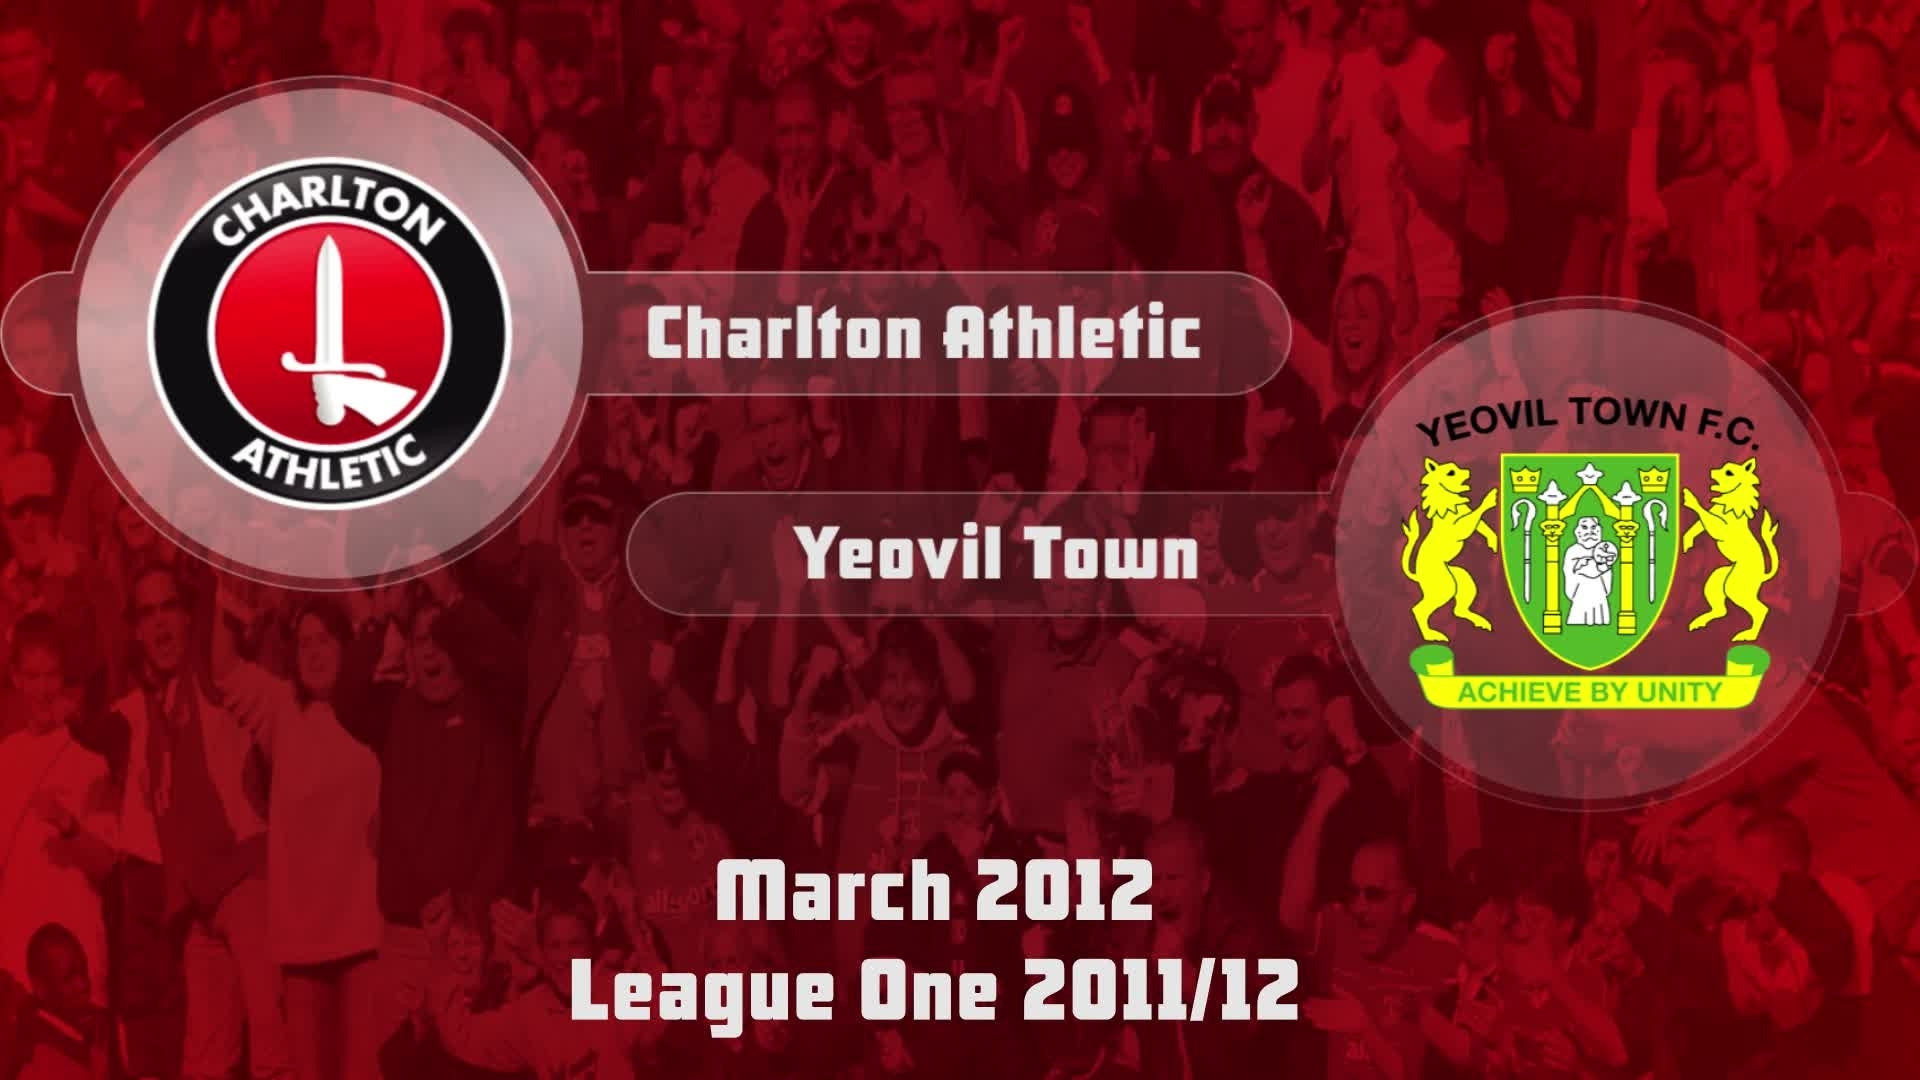 44 HIGHLIGHTS | Charlton 3 Yeovil 0 (March 2012)